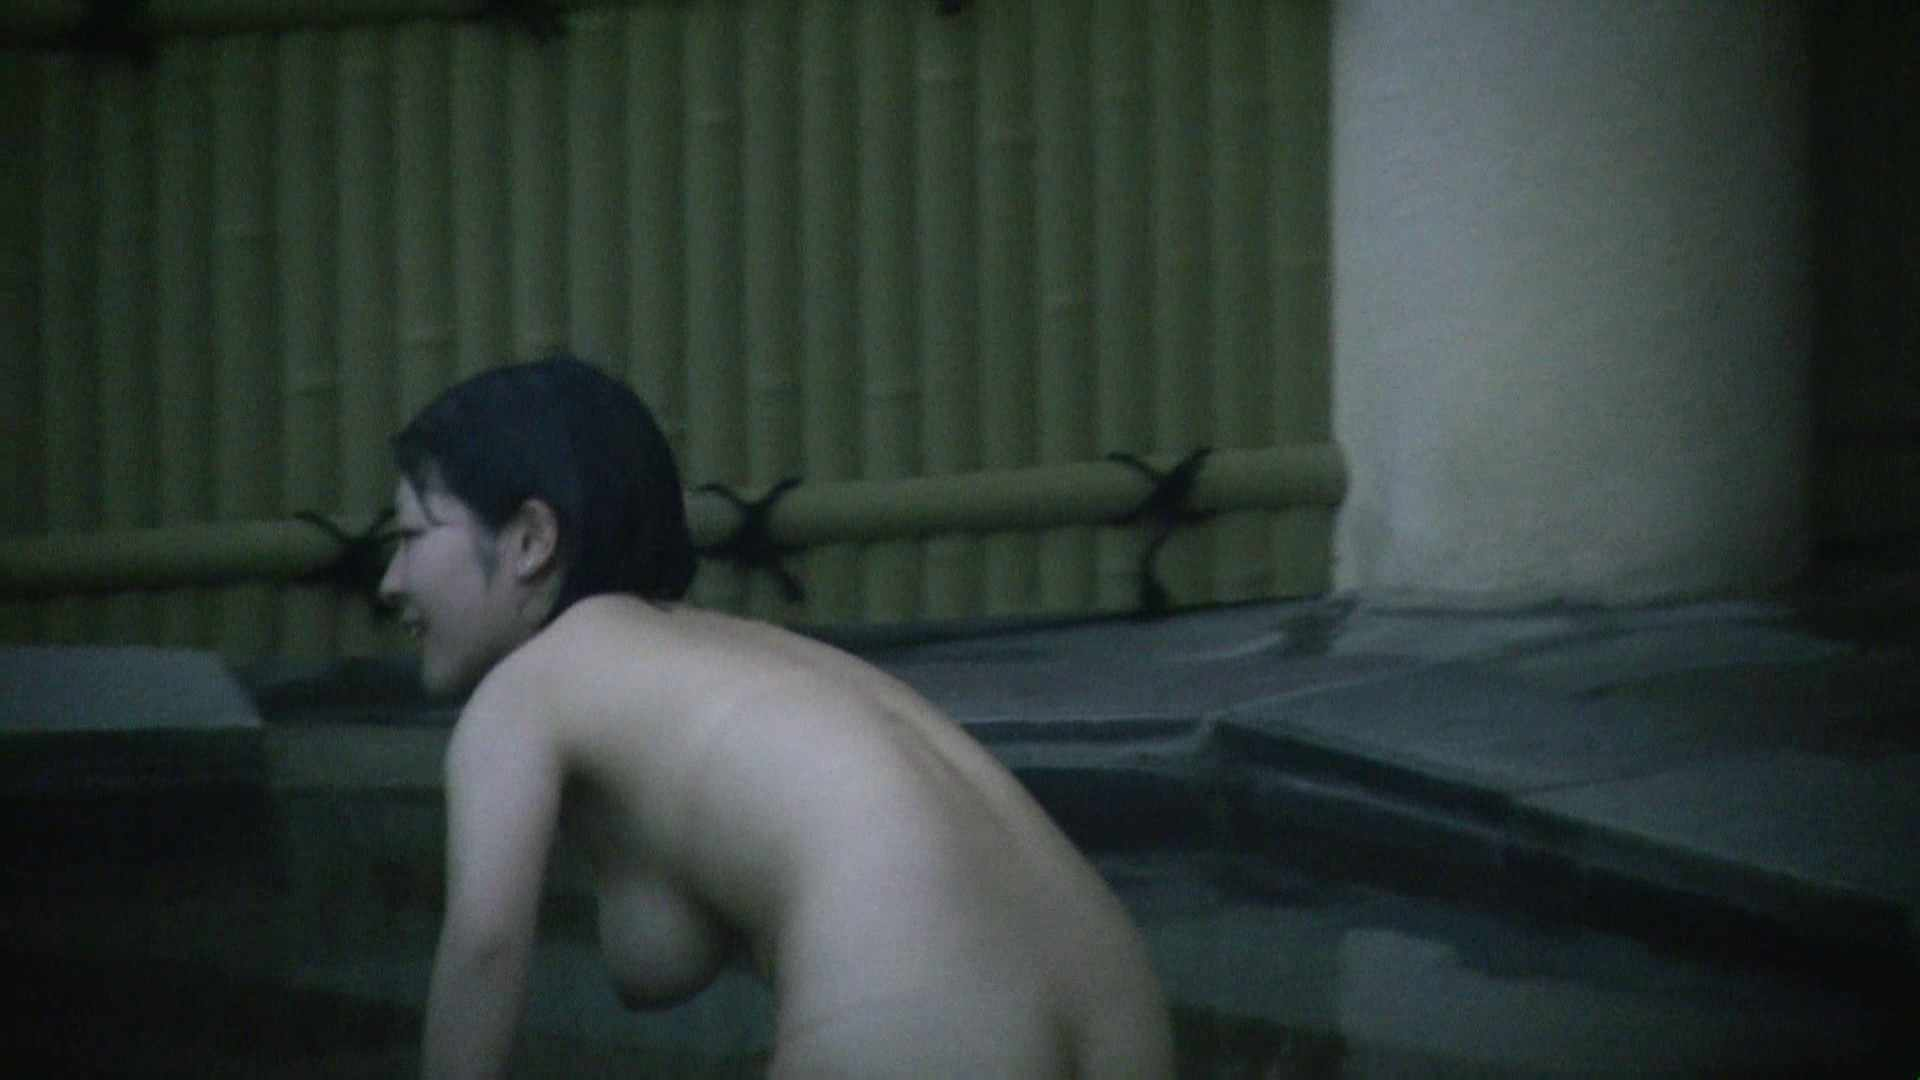 Aquaな露天風呂Vol.05【VIP】 露天風呂編 | 盗撮シリーズ  112PIX 85